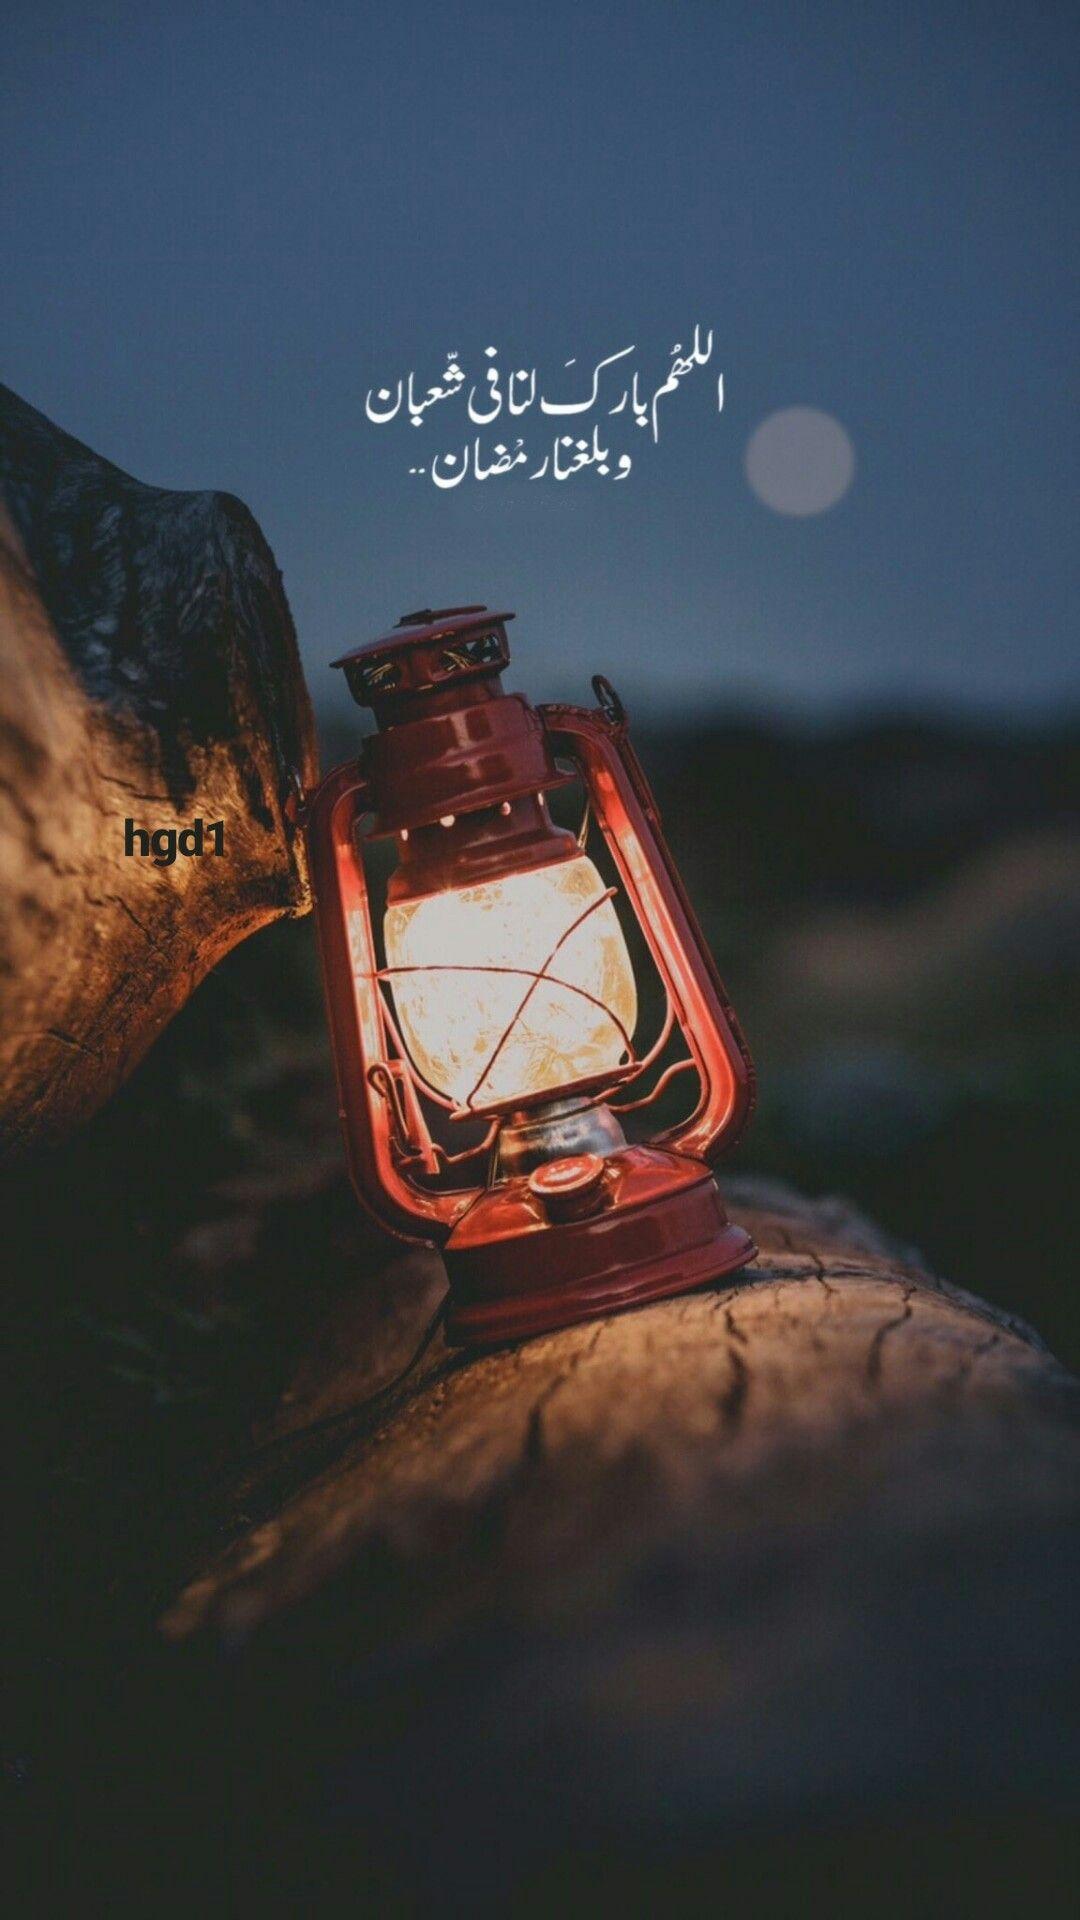 اللهم بارك لنا في شعبان وبلغنا رمضان H G Muslim Images Birthday Girl Pictures Morning Images